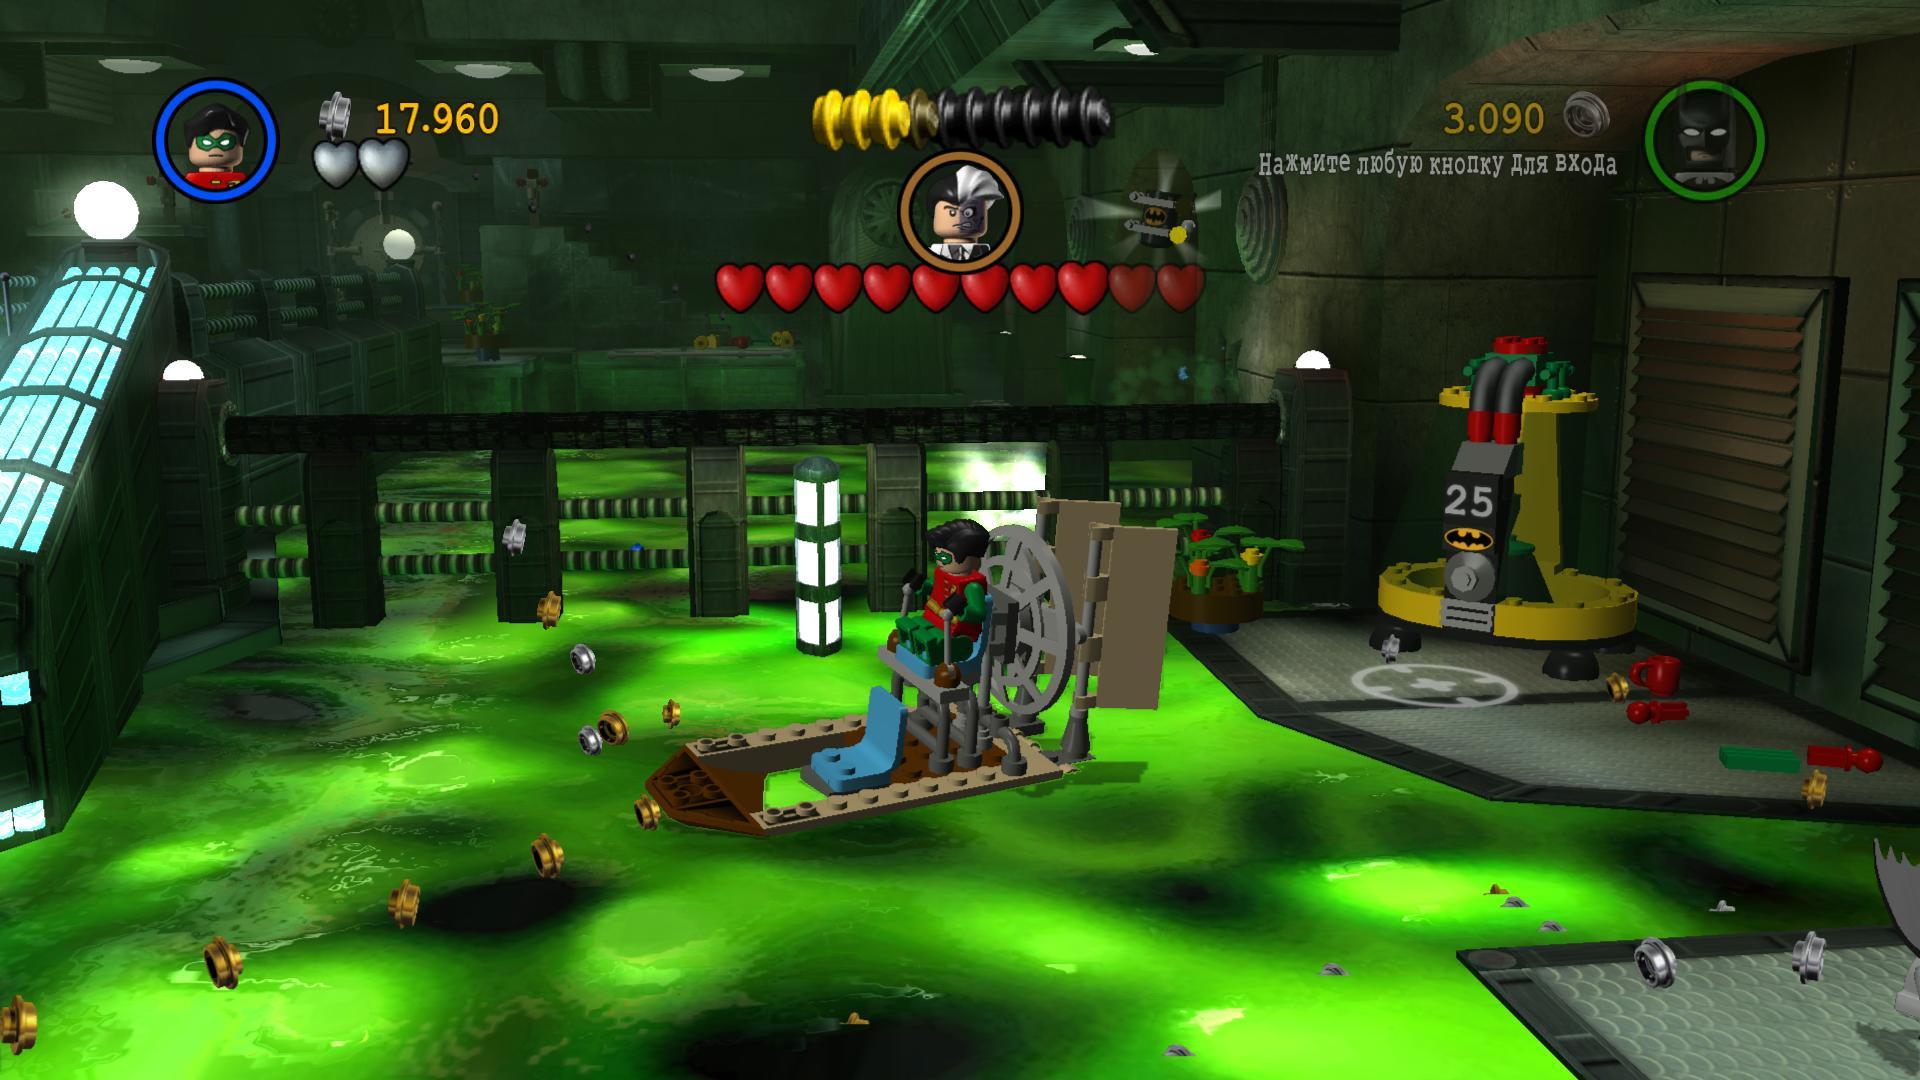 LEGO Batman - PlayGamesOnline